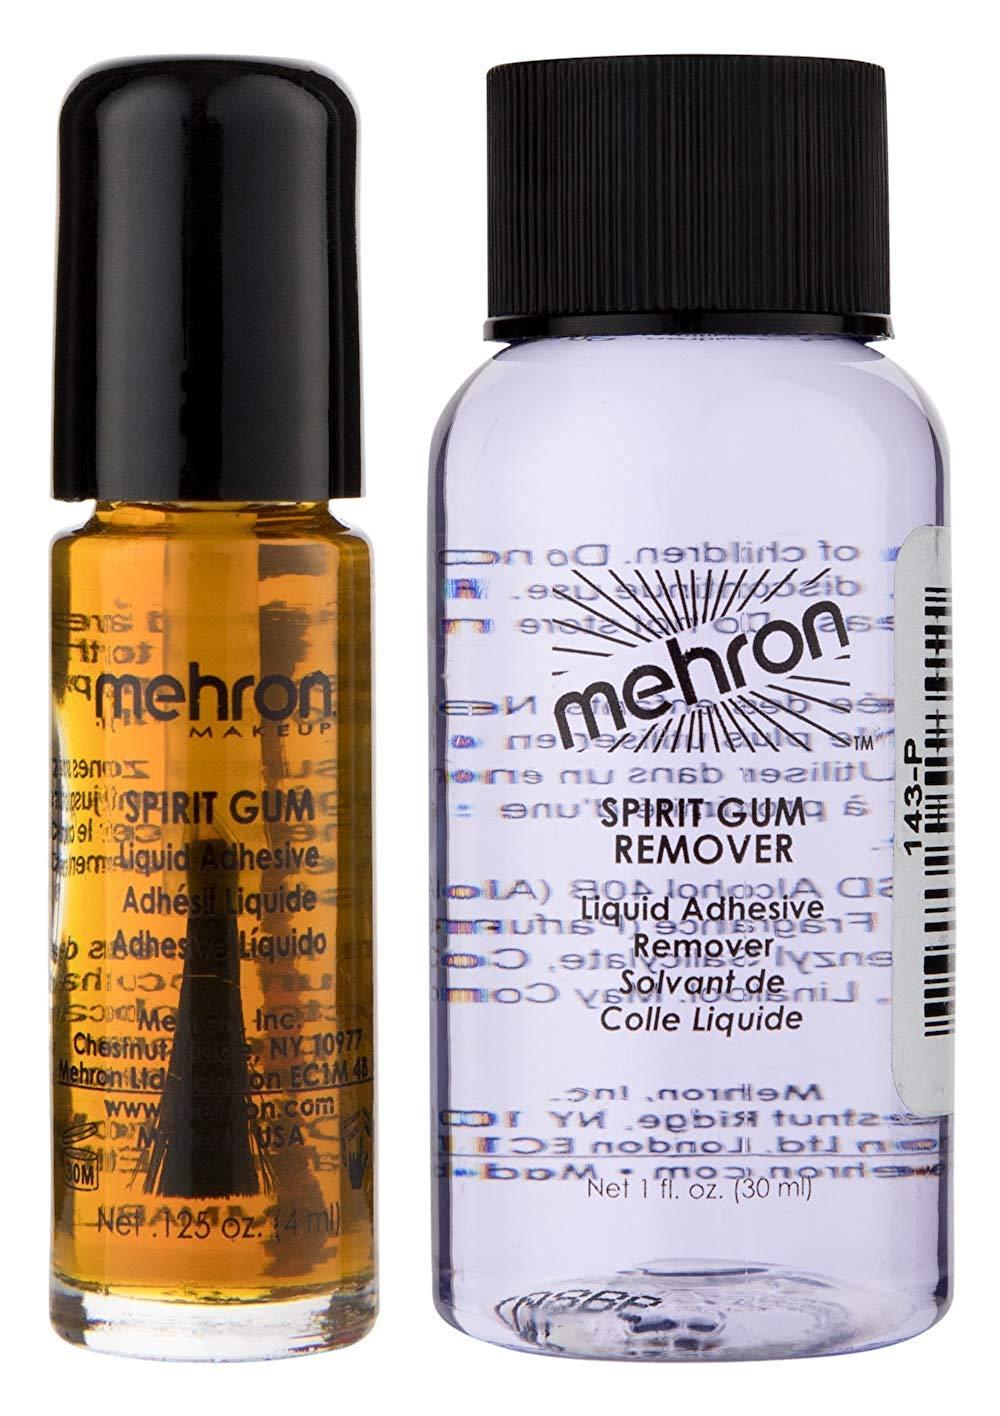 Mehron Makeup Spirit Gum and Spirit Gum Remover Combo set (.125 oz) by Mehron